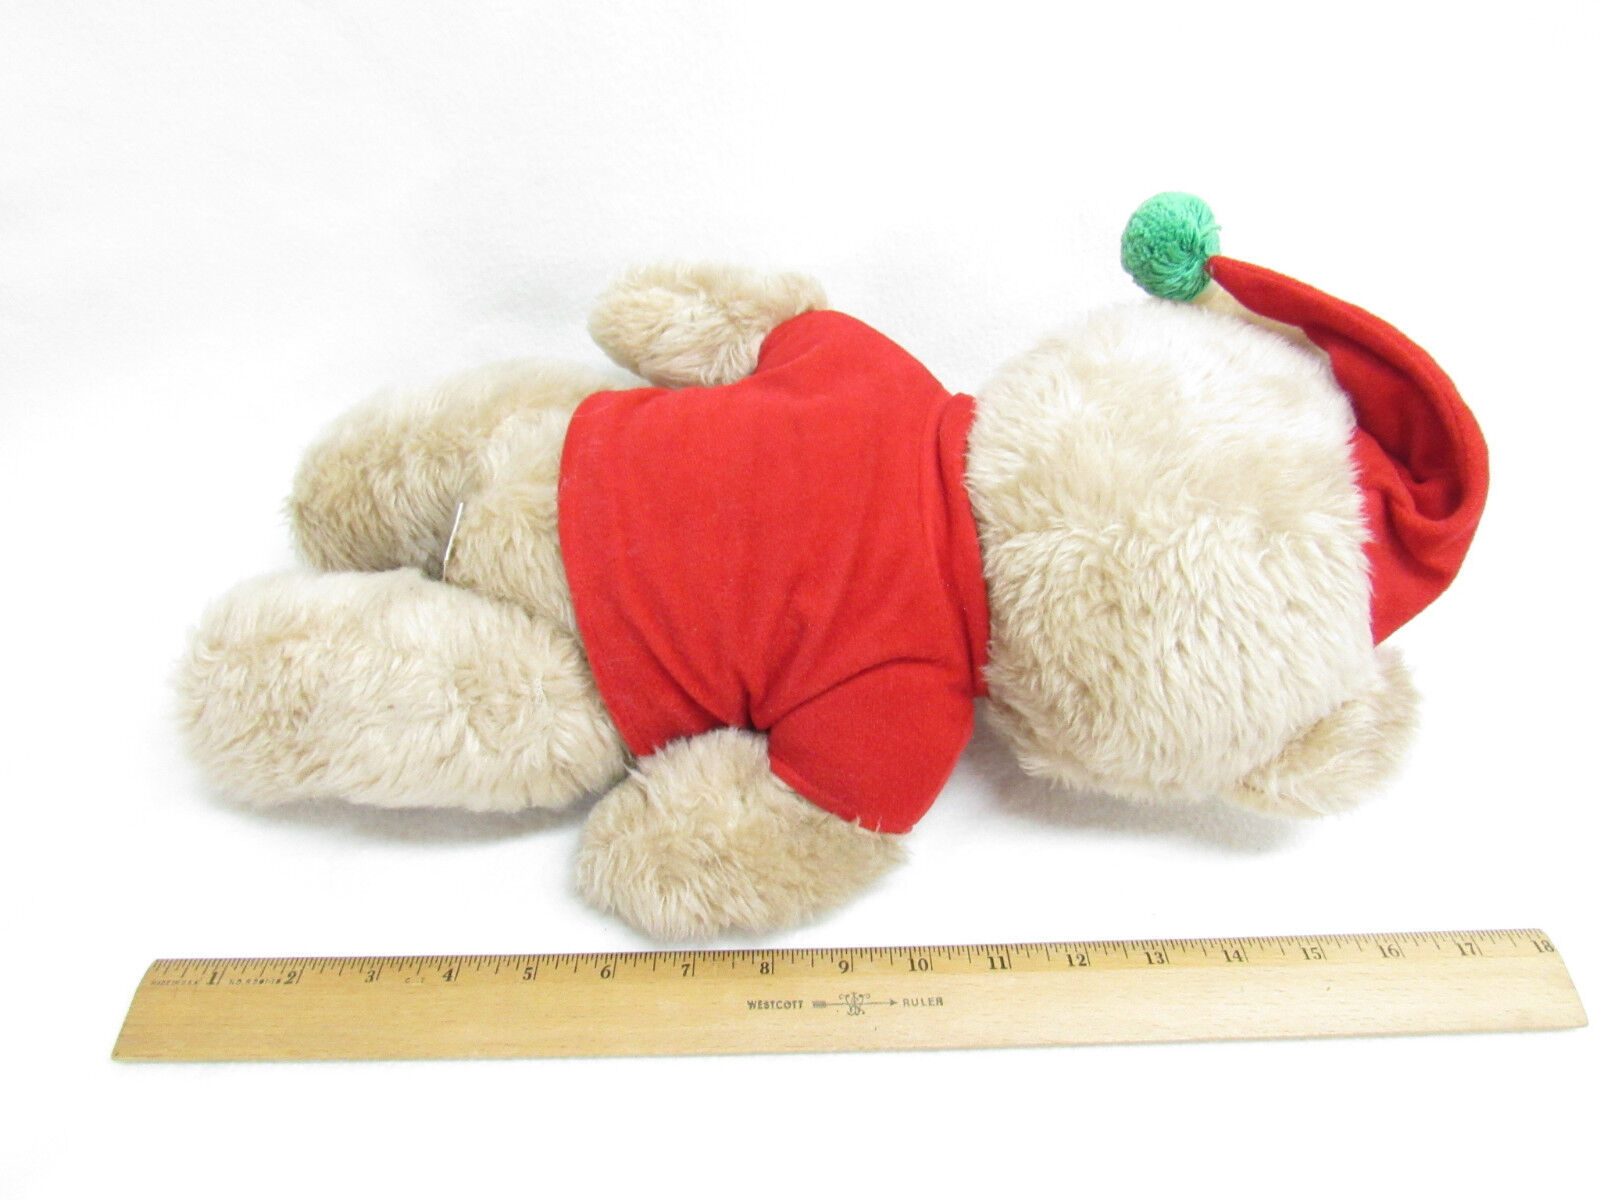 VTG BEAR MON PETIT CHOU LTD CHRISTMAS TEDDY BEAR VTG JOINTED PLUSH 15a138